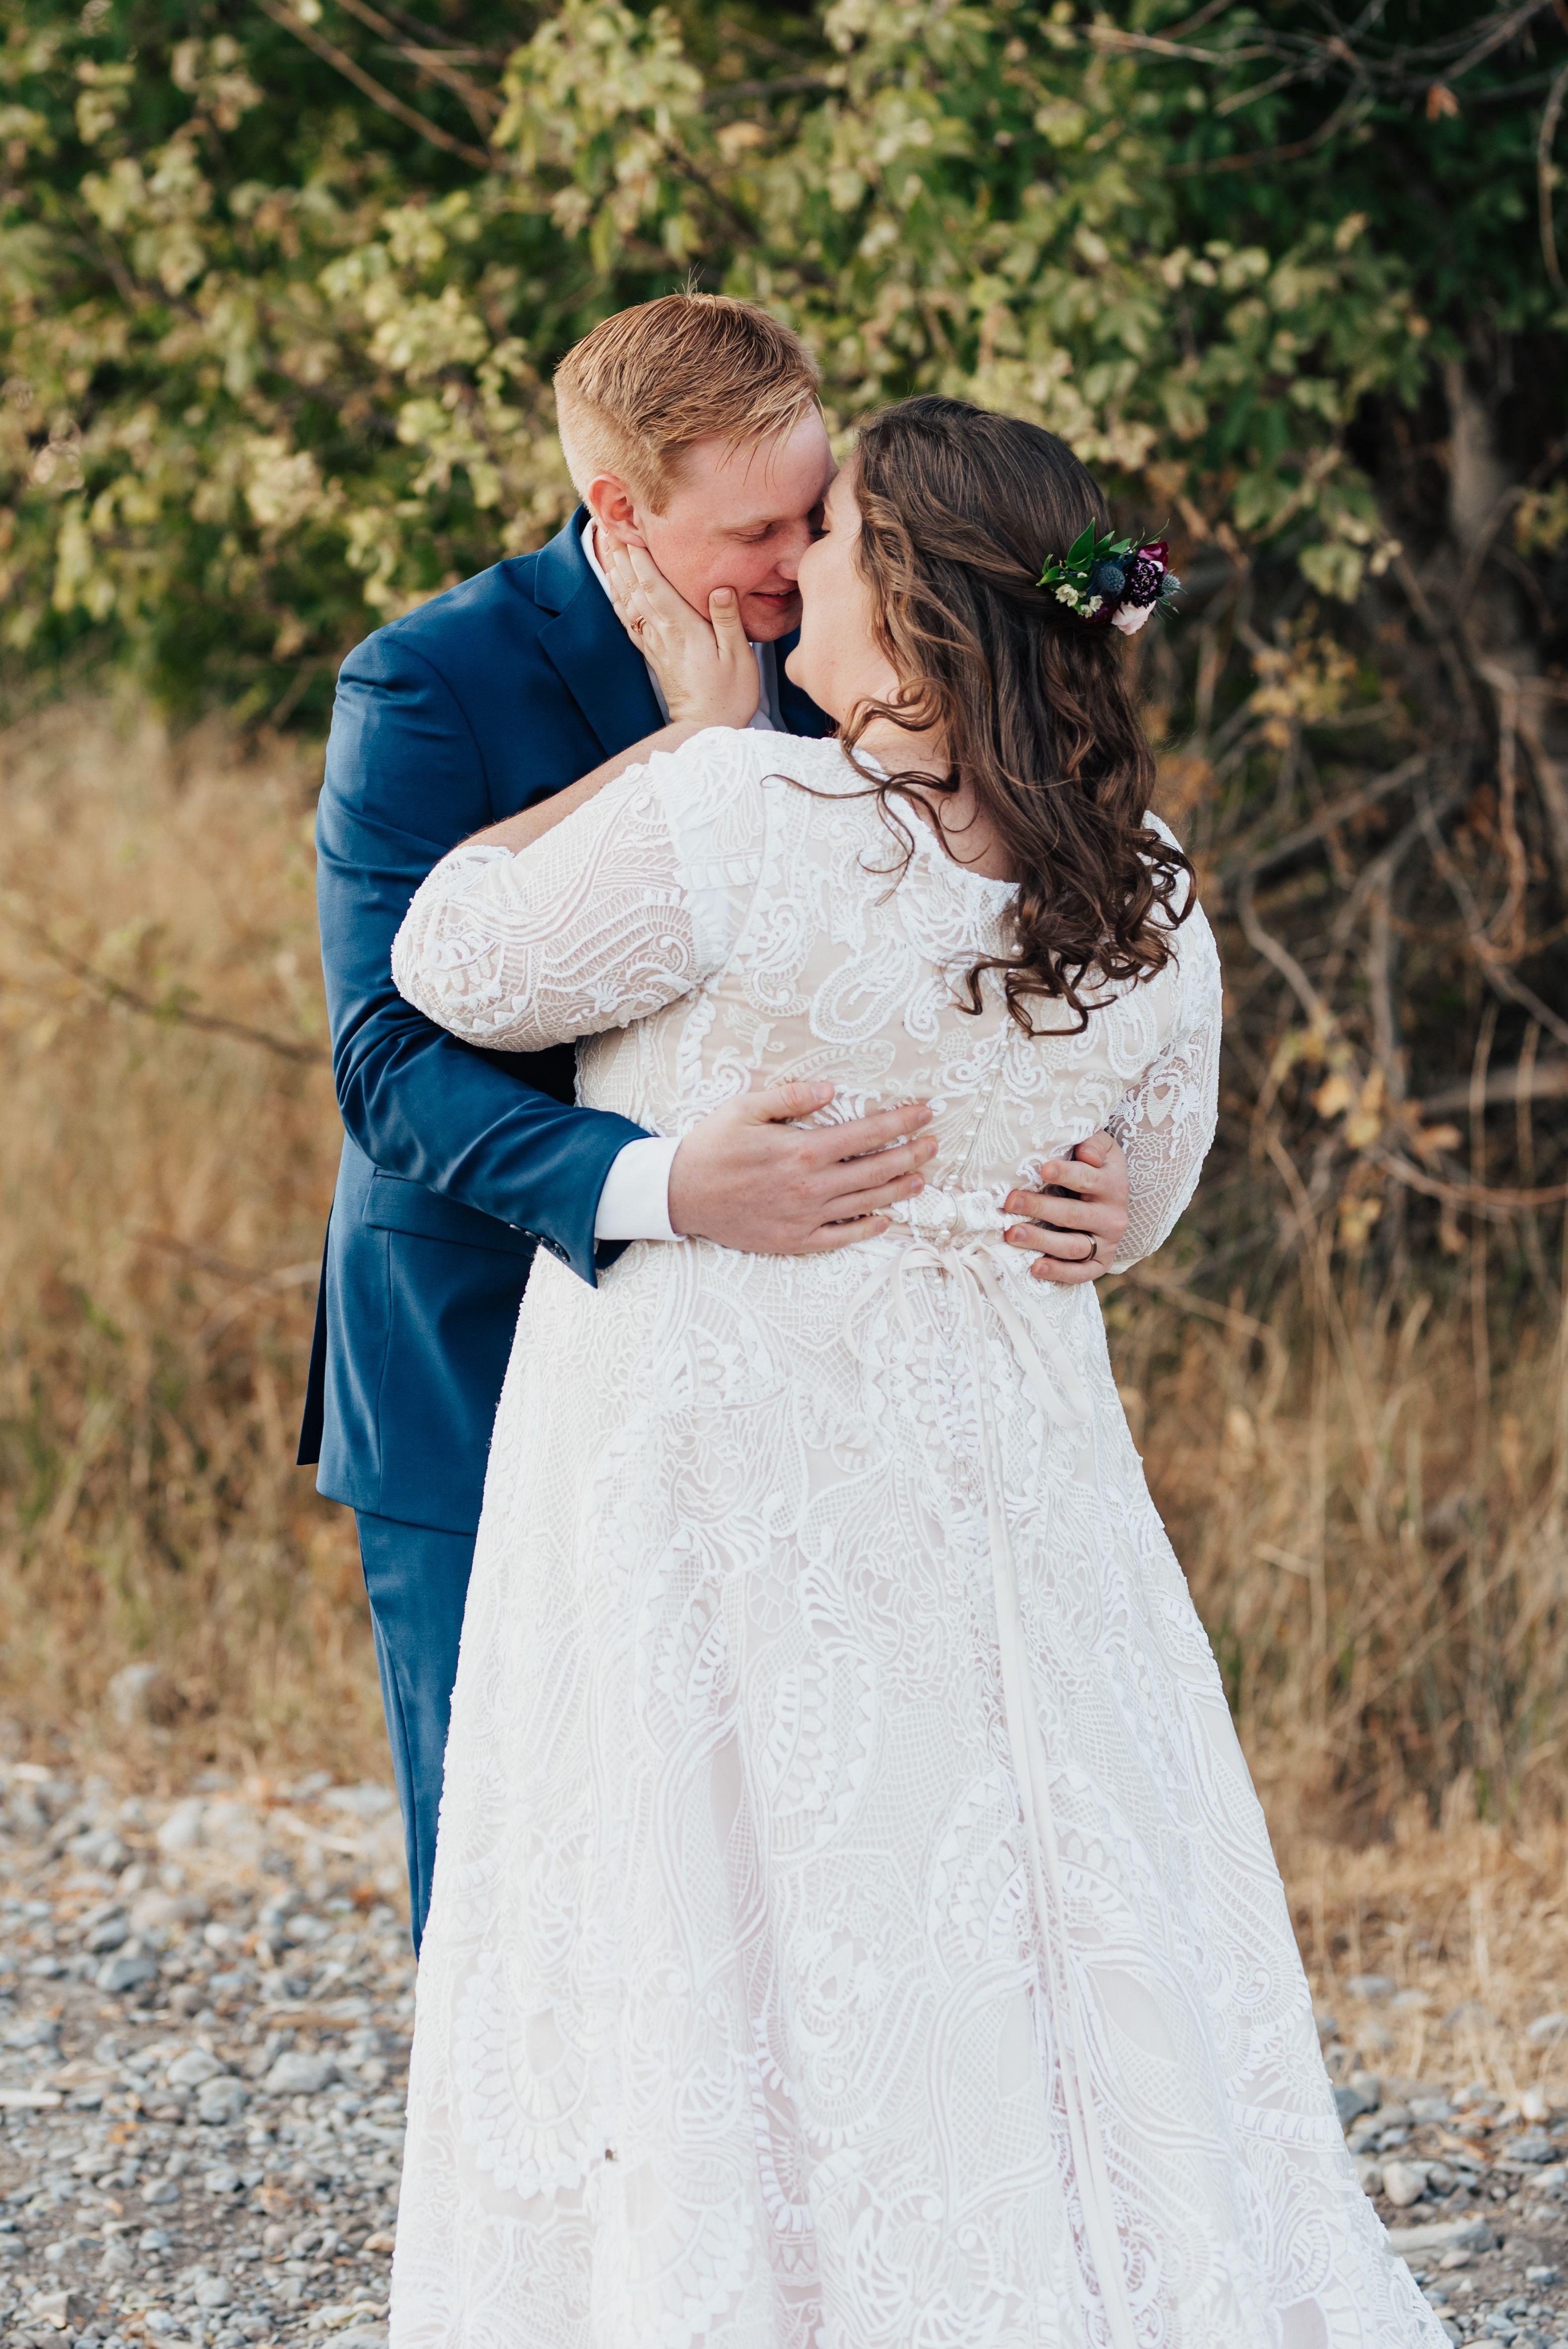 Antonia Wedding Dresses Modest Wedding Dresses Dresses [ 4731 x 3158 Pixel ]